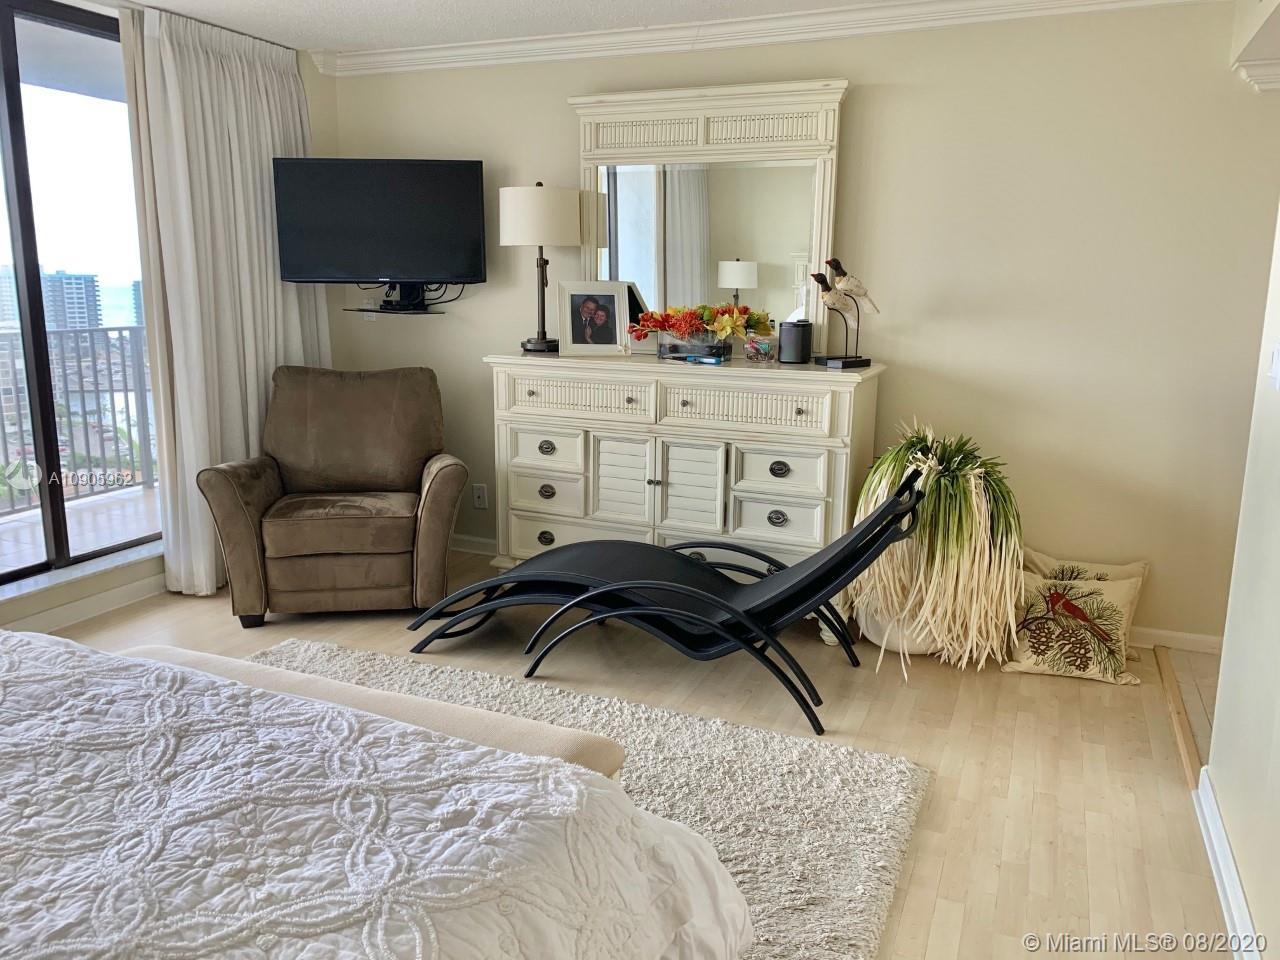 Photo of 300 Three Islands Blvd #618, Hallandale Beach, Florida, 33009 - MASTER BEDROOM BALCONY VIEW!